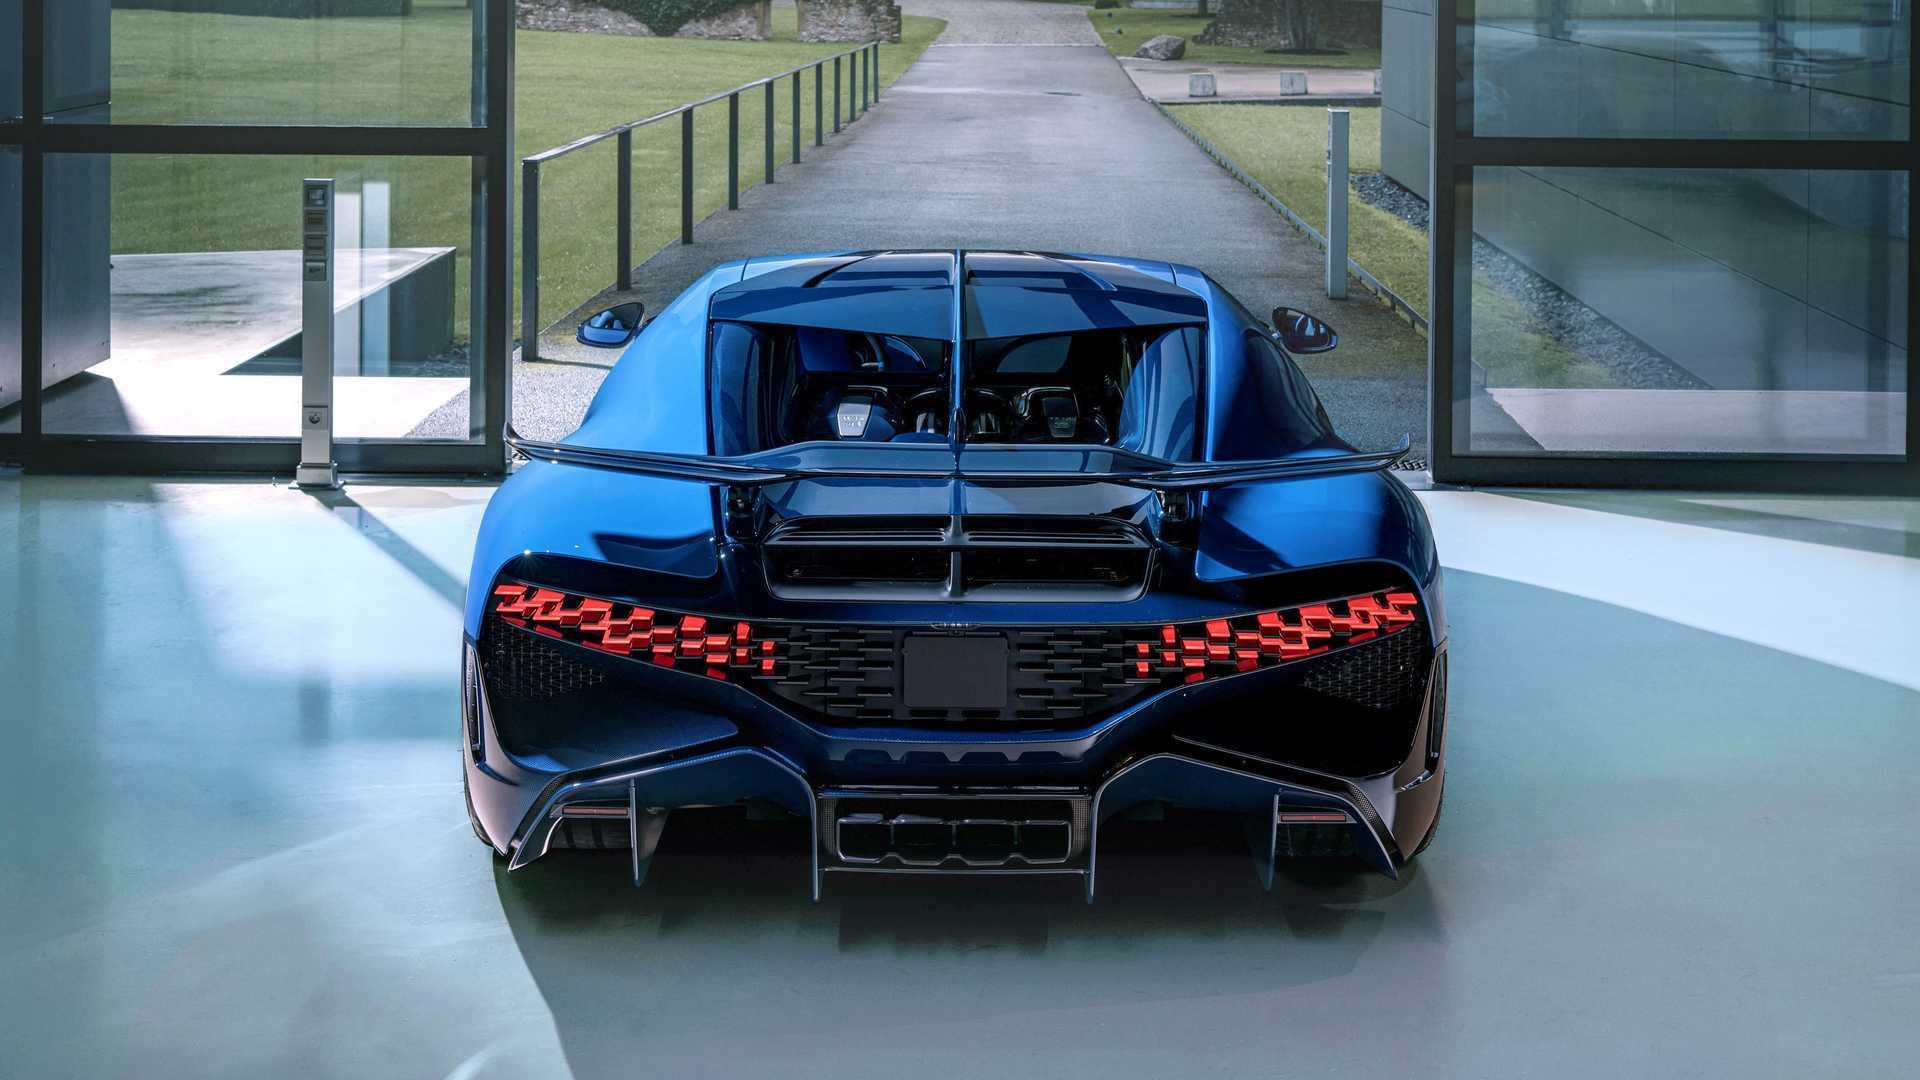 https://cdn.motor1.com/images/mgl/33AYY/s6/bugatti-divo-rear-view.jpg